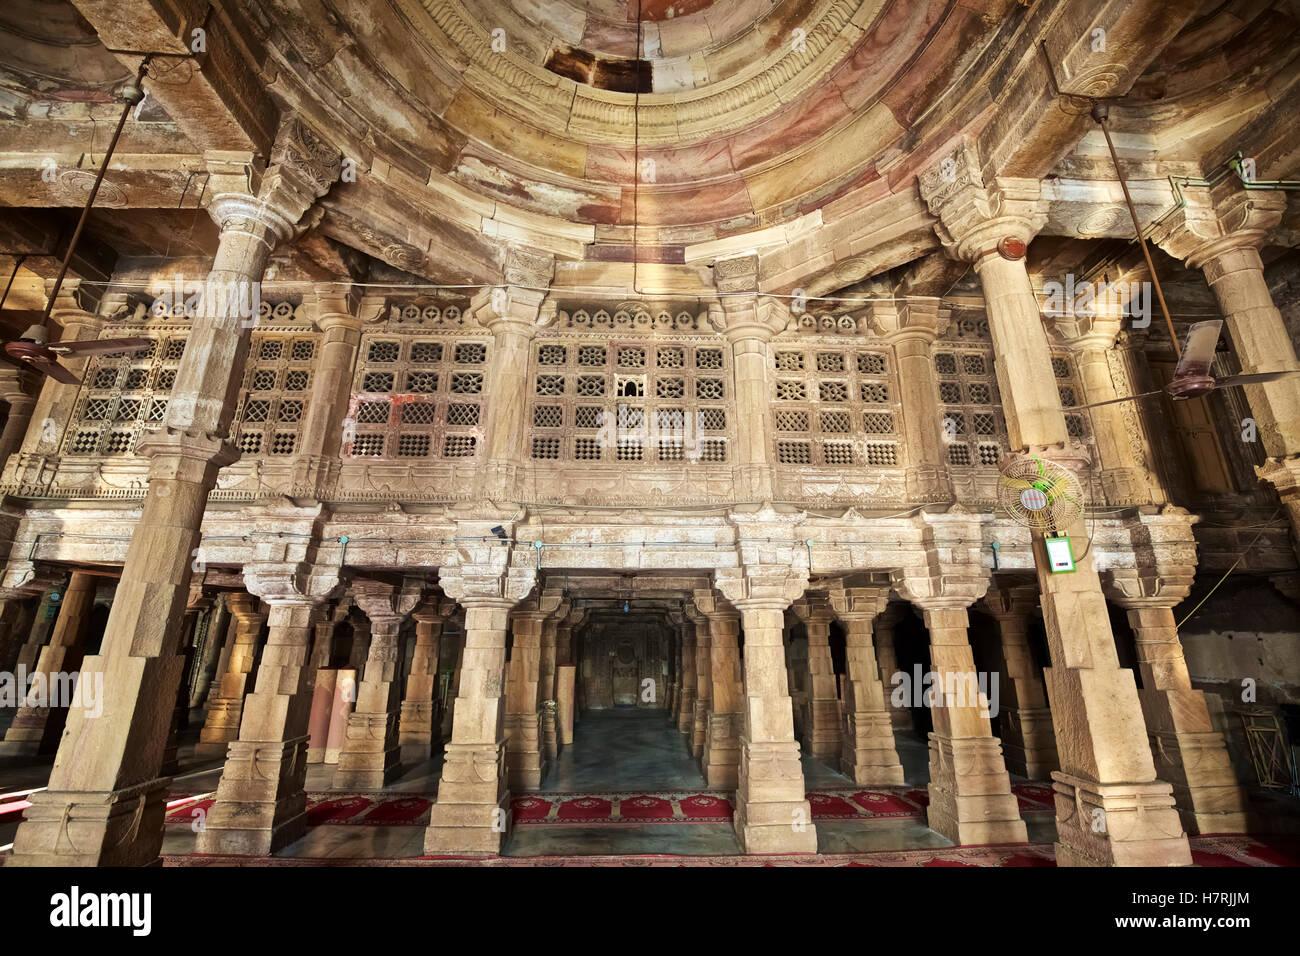 Domed, columned interior of 15th C Jumma Masjid mosque Stock Photo